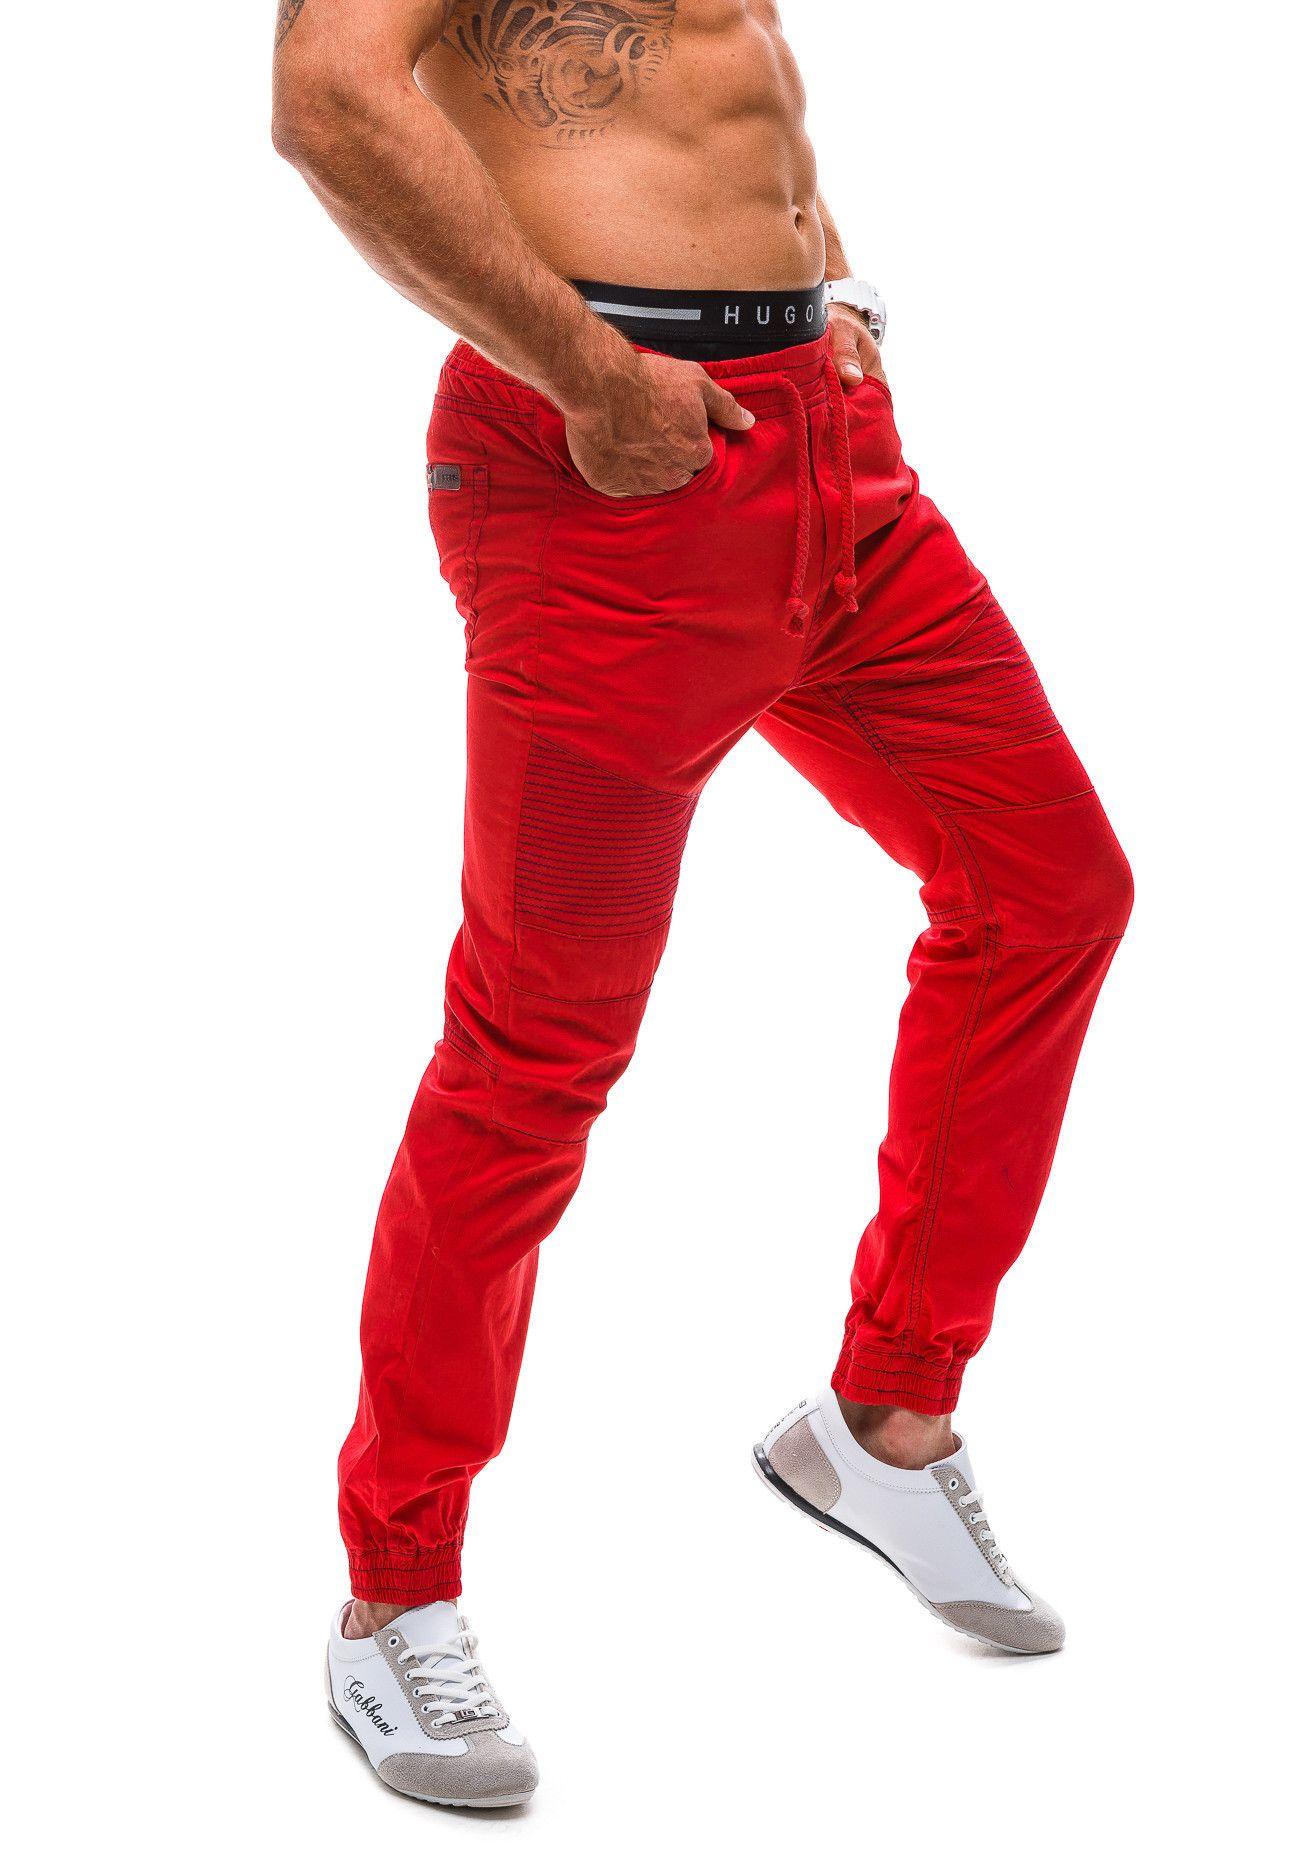 Spodnie Meskie Joggery Red Polo 603 Czerwone Sweatpants Pants Parachute Pants